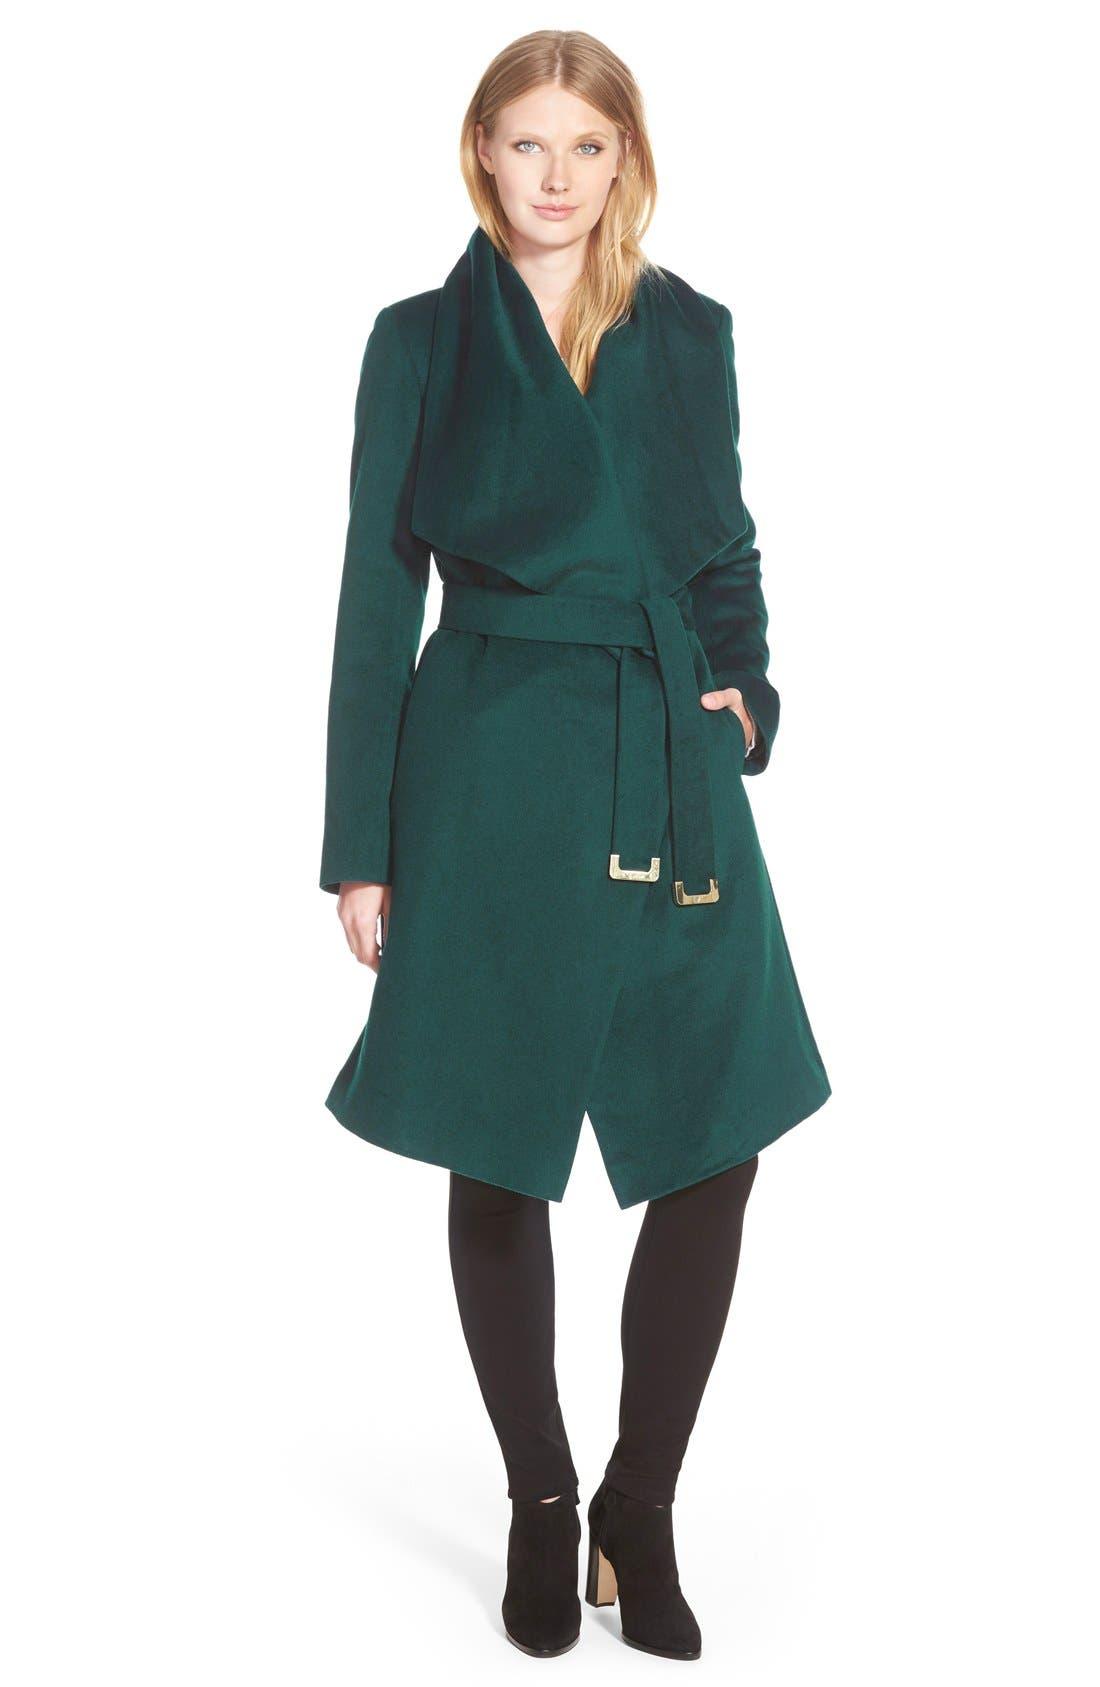 Alternate Image 1 Selected - Diane von Furstenberg 'Harlow' Drape Collar Wool Blend Wrap Coat